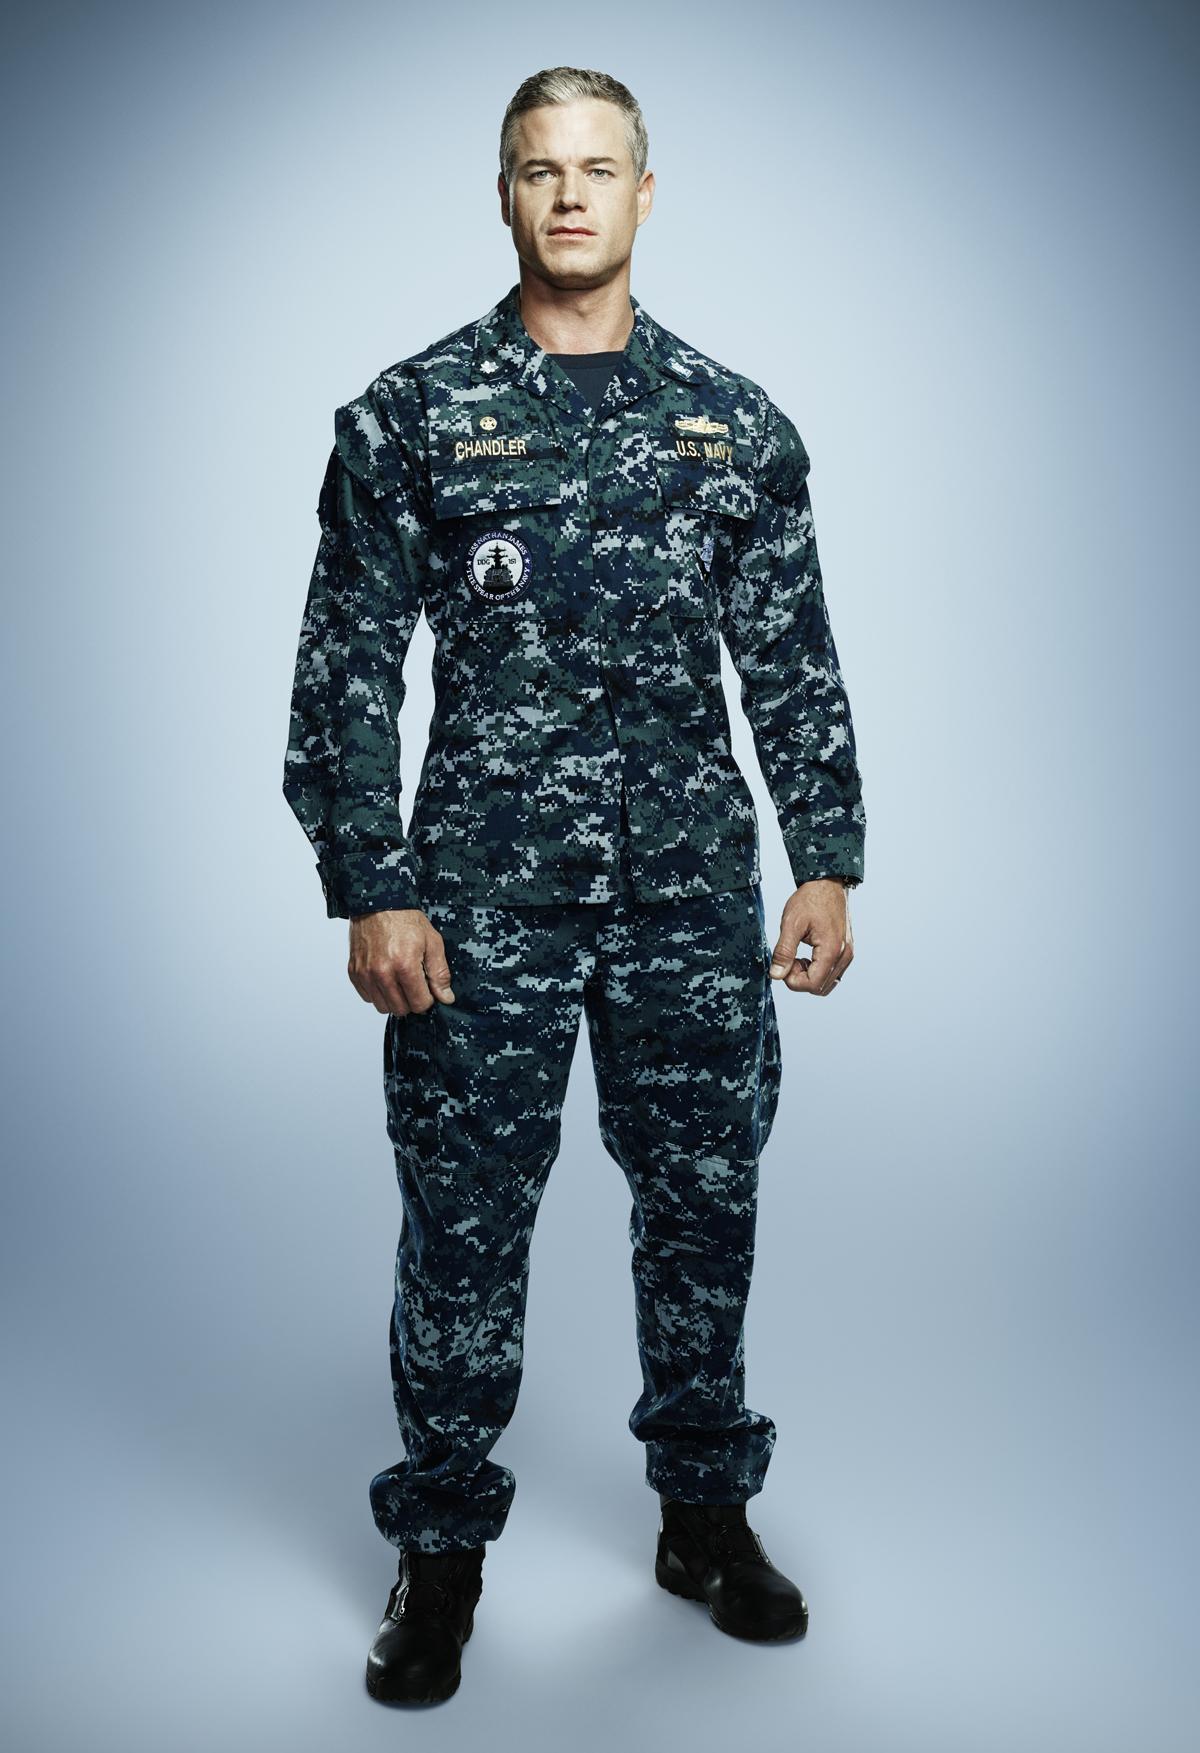 Exclusive Interview: Eric Dane commands THE LAST SHIP on TNT ...